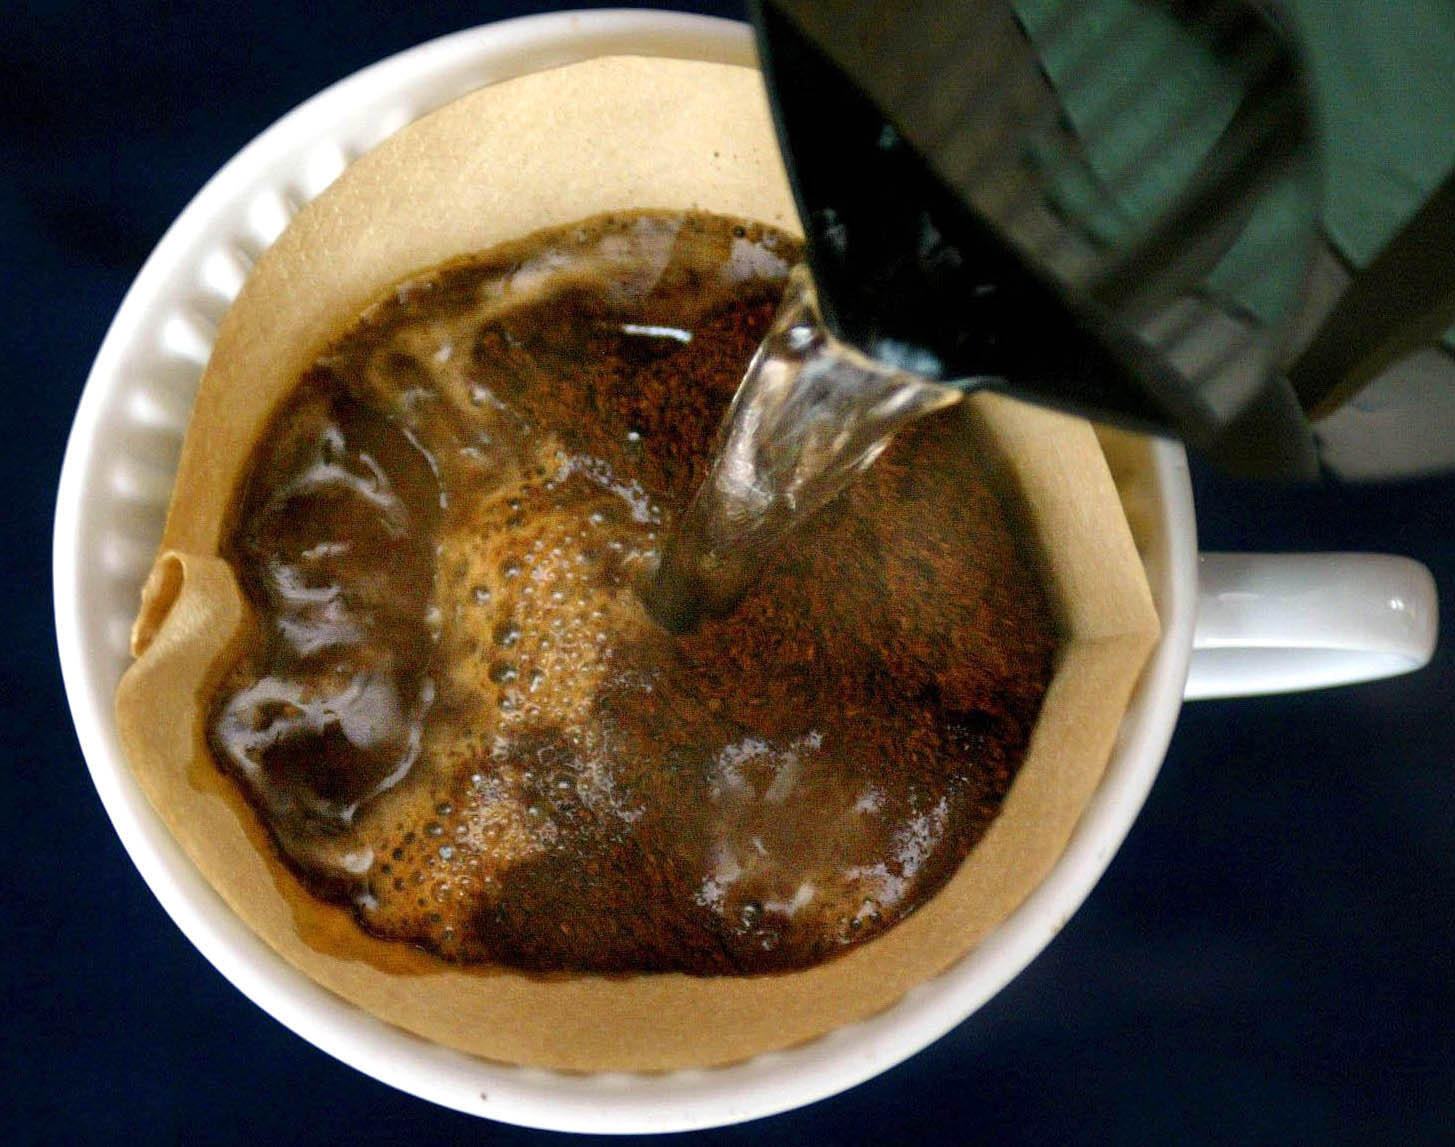 Krebserregendes Acrylamid in vielen Kaffeesorten